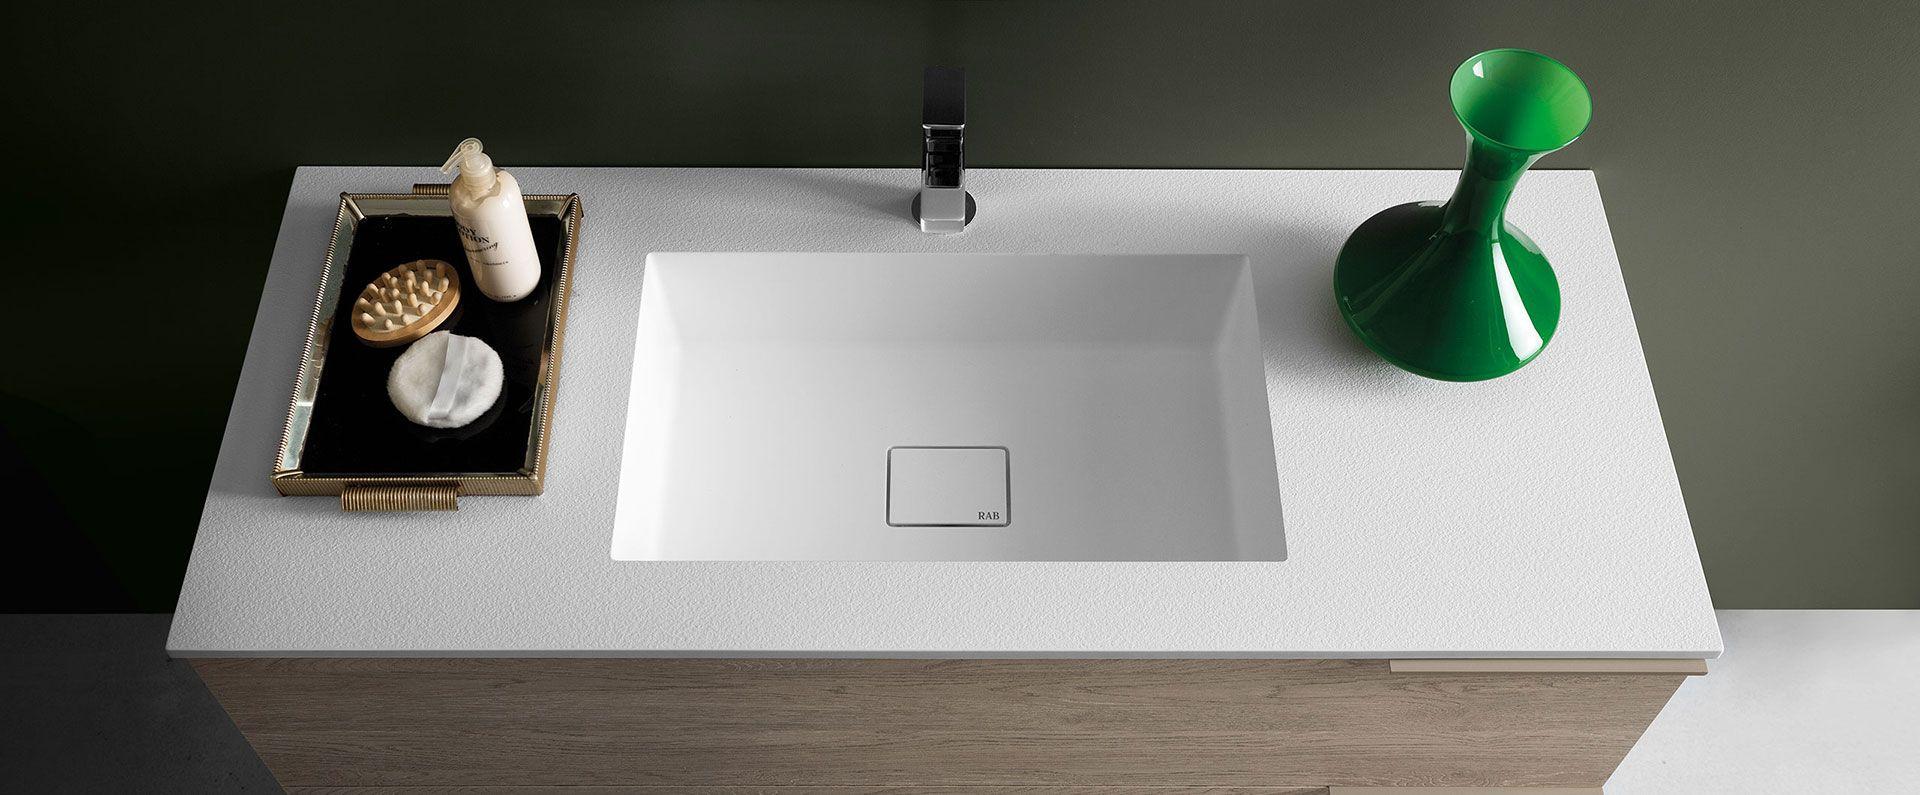 Rab Arredobagno: mobili bagno moderni, vasche da bagno e piatti ...